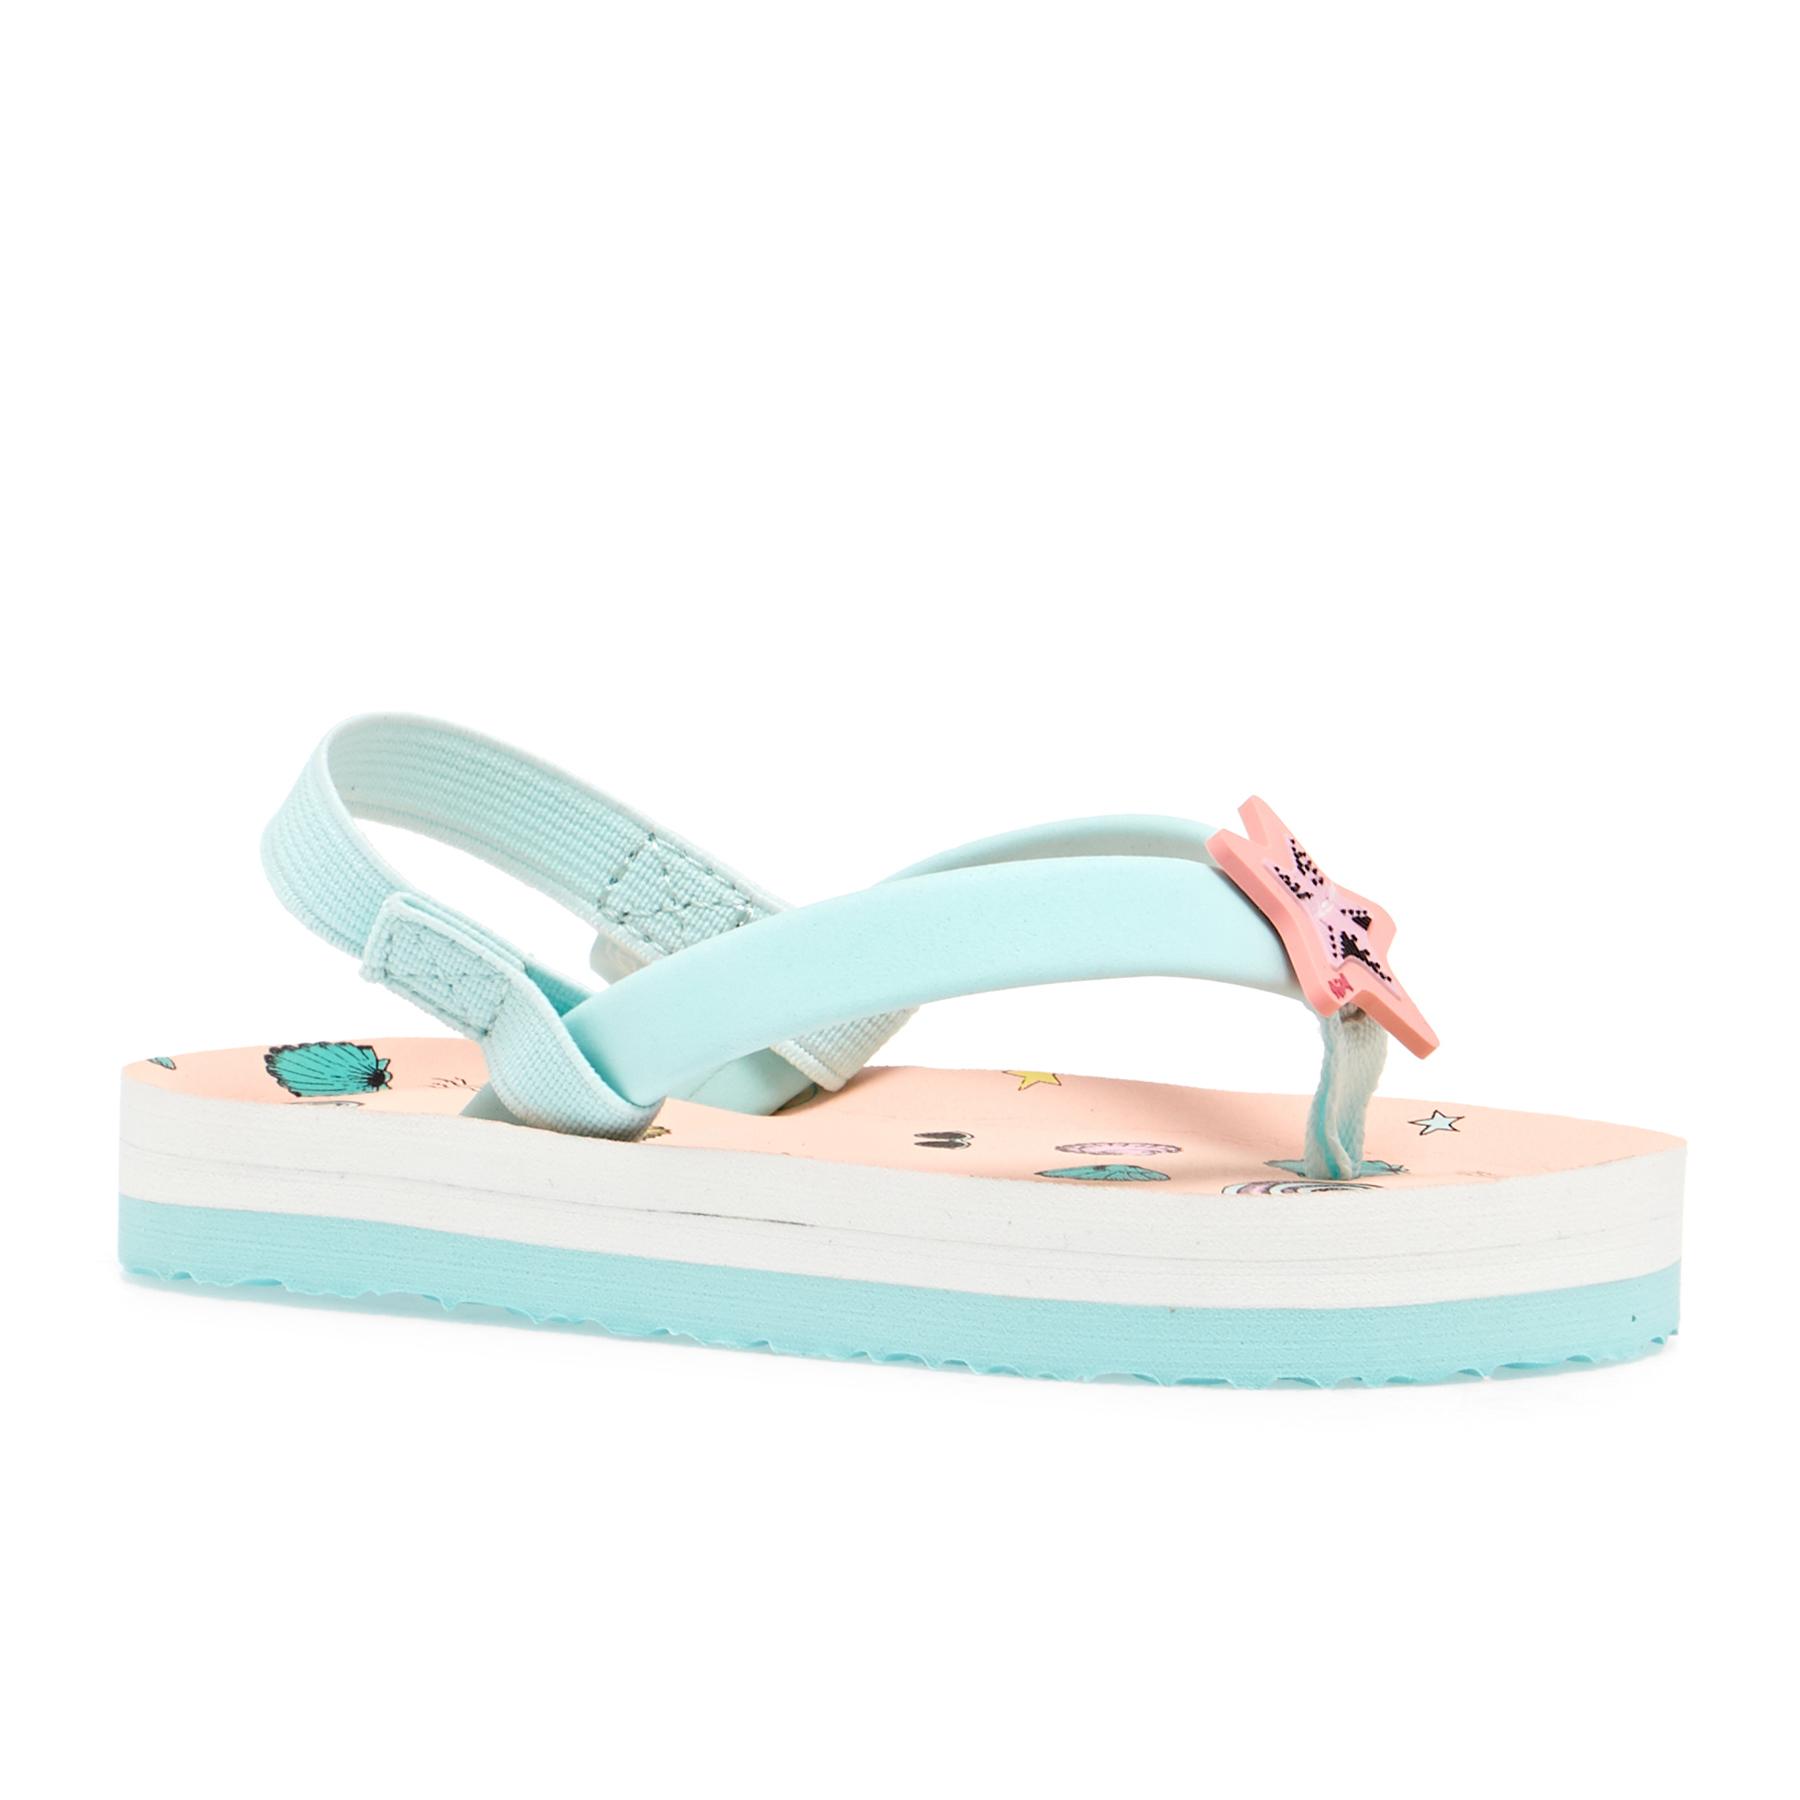 Animal Boys Bodhy Holiday Beach Sandals